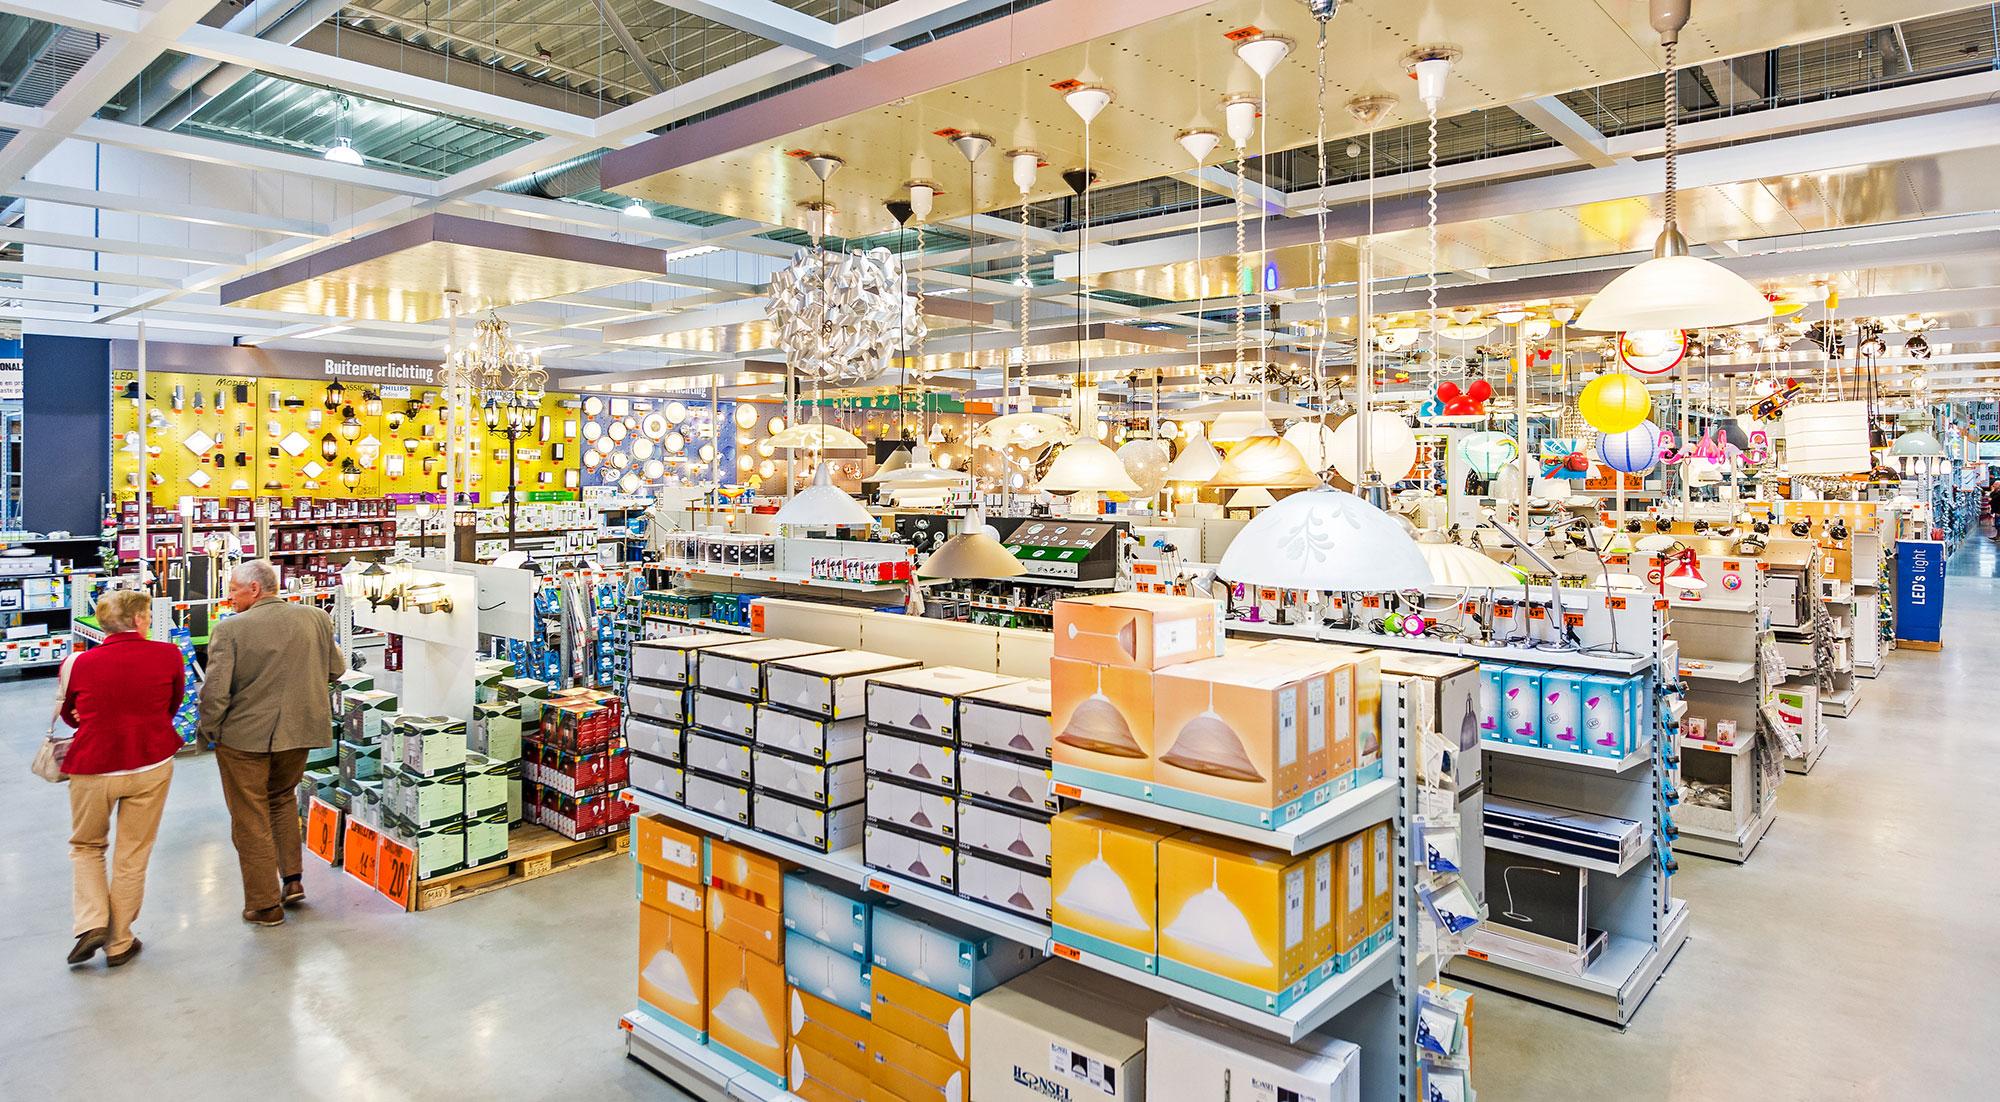 Hornbach Keukens Groningen : Nieuwe verlichtingsafdeling Hornbach Alblasserdam